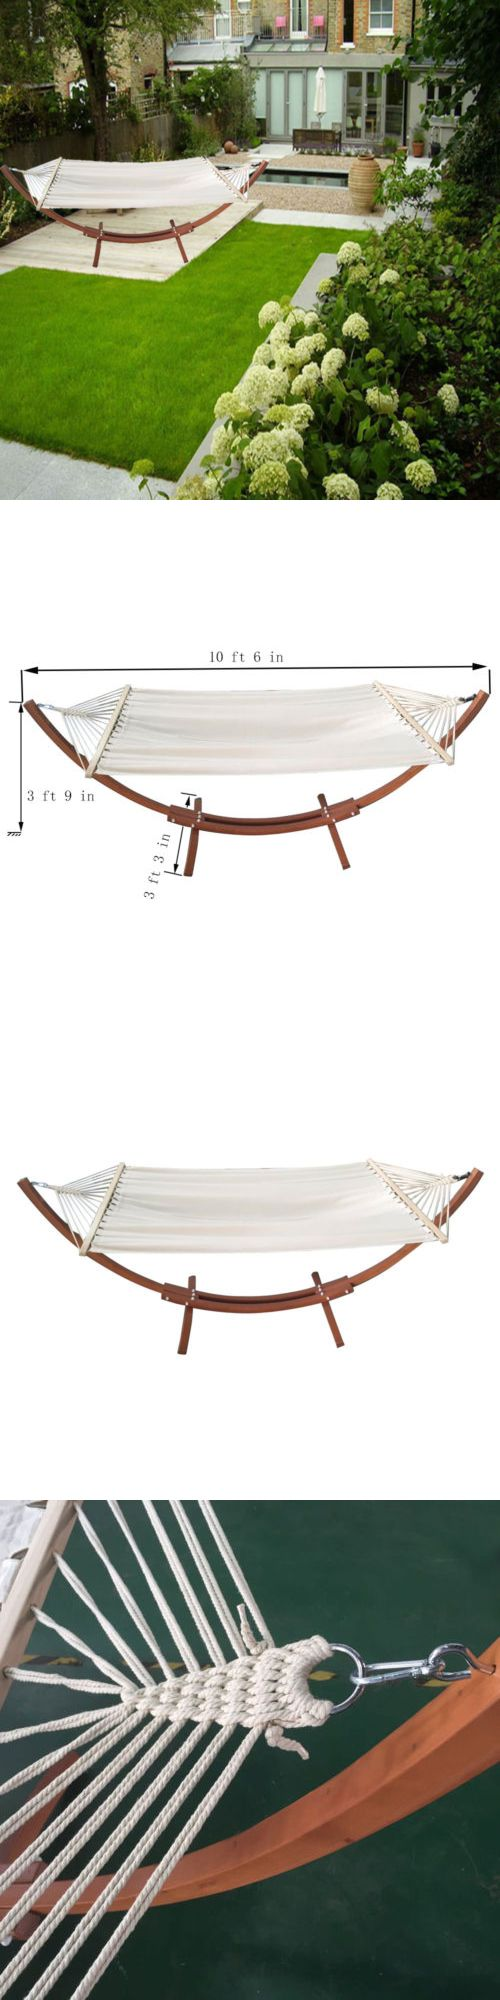 Hammocks 20719: 110 Wooden Curved Arc Hammock Stand W Hammocksize Outdoor Patio Garden Swing -> BUY IT NOW ONLY: $110 on eBay!